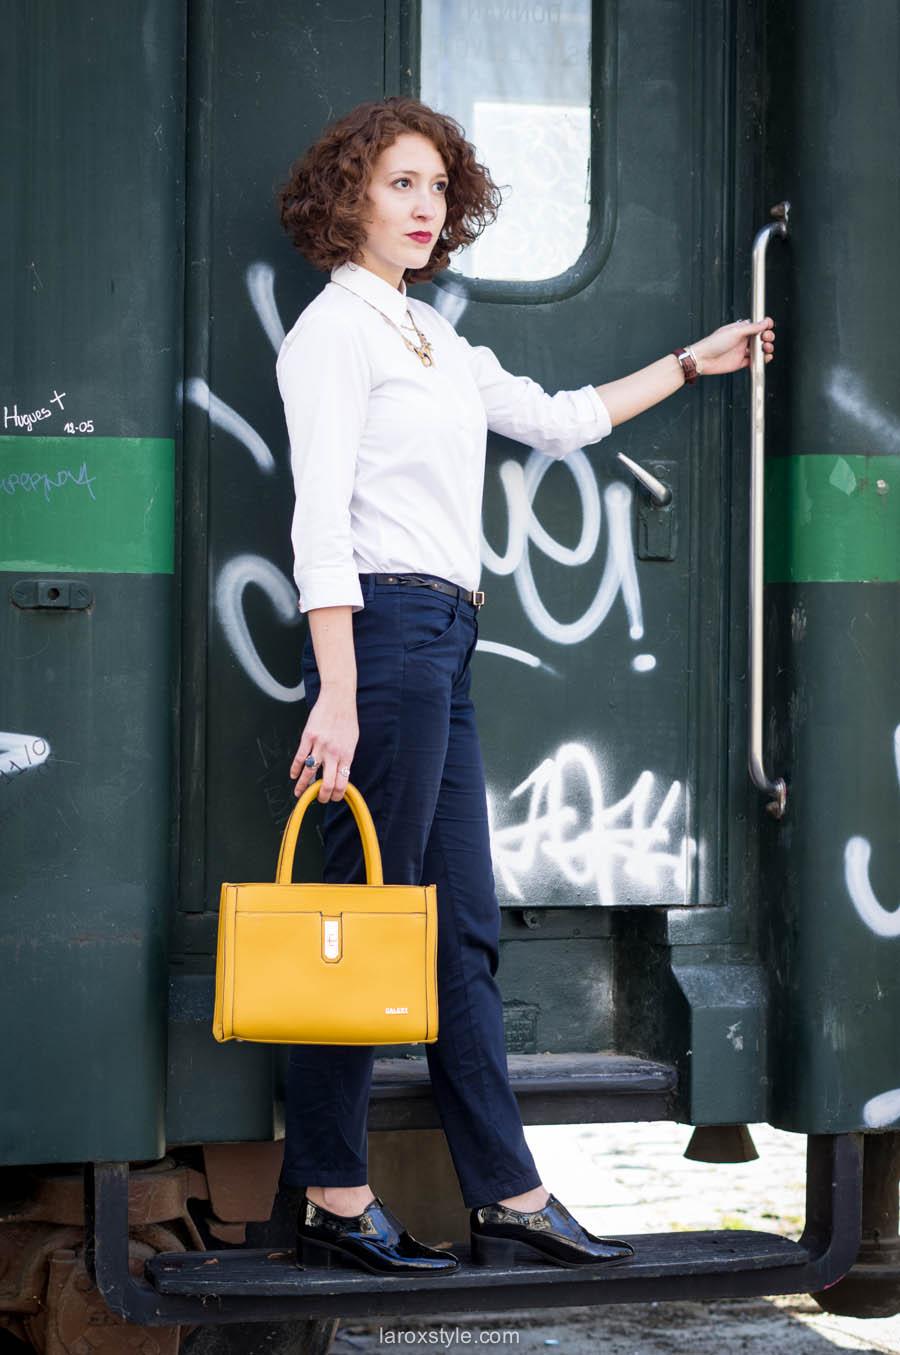 Street working girl